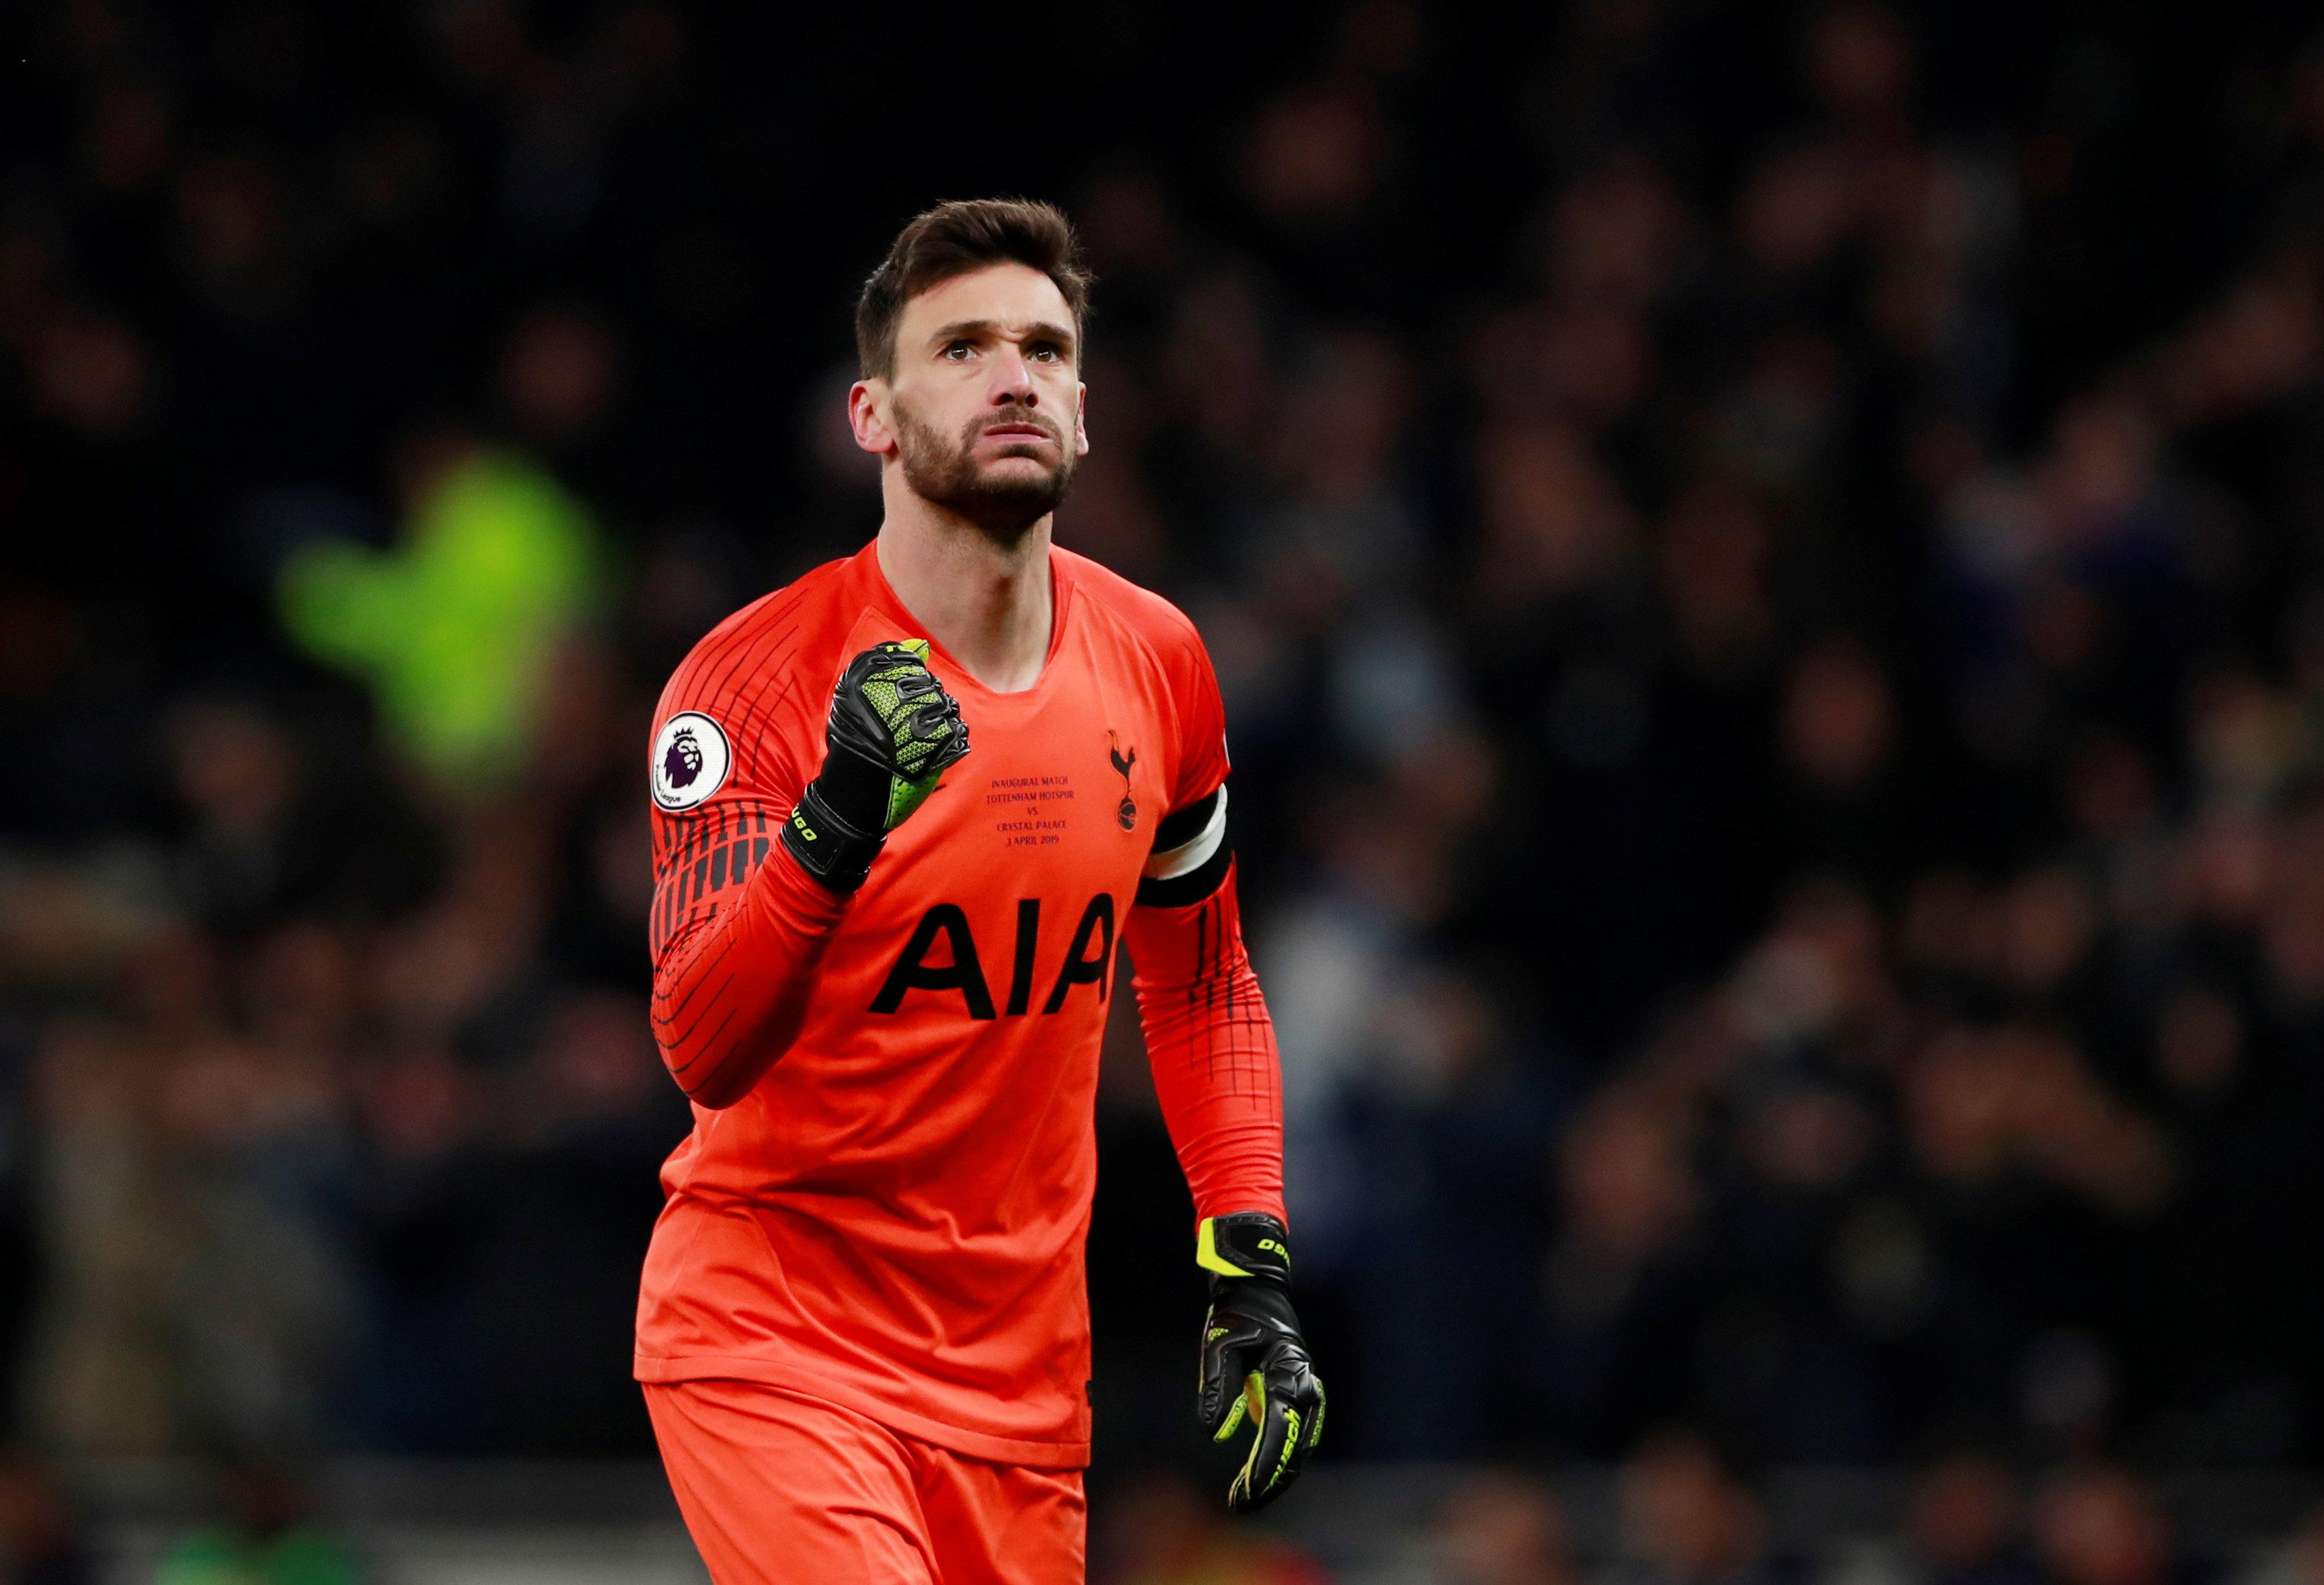 Football - Etranger - Premier League : Tottenham-Huddersfield en direct